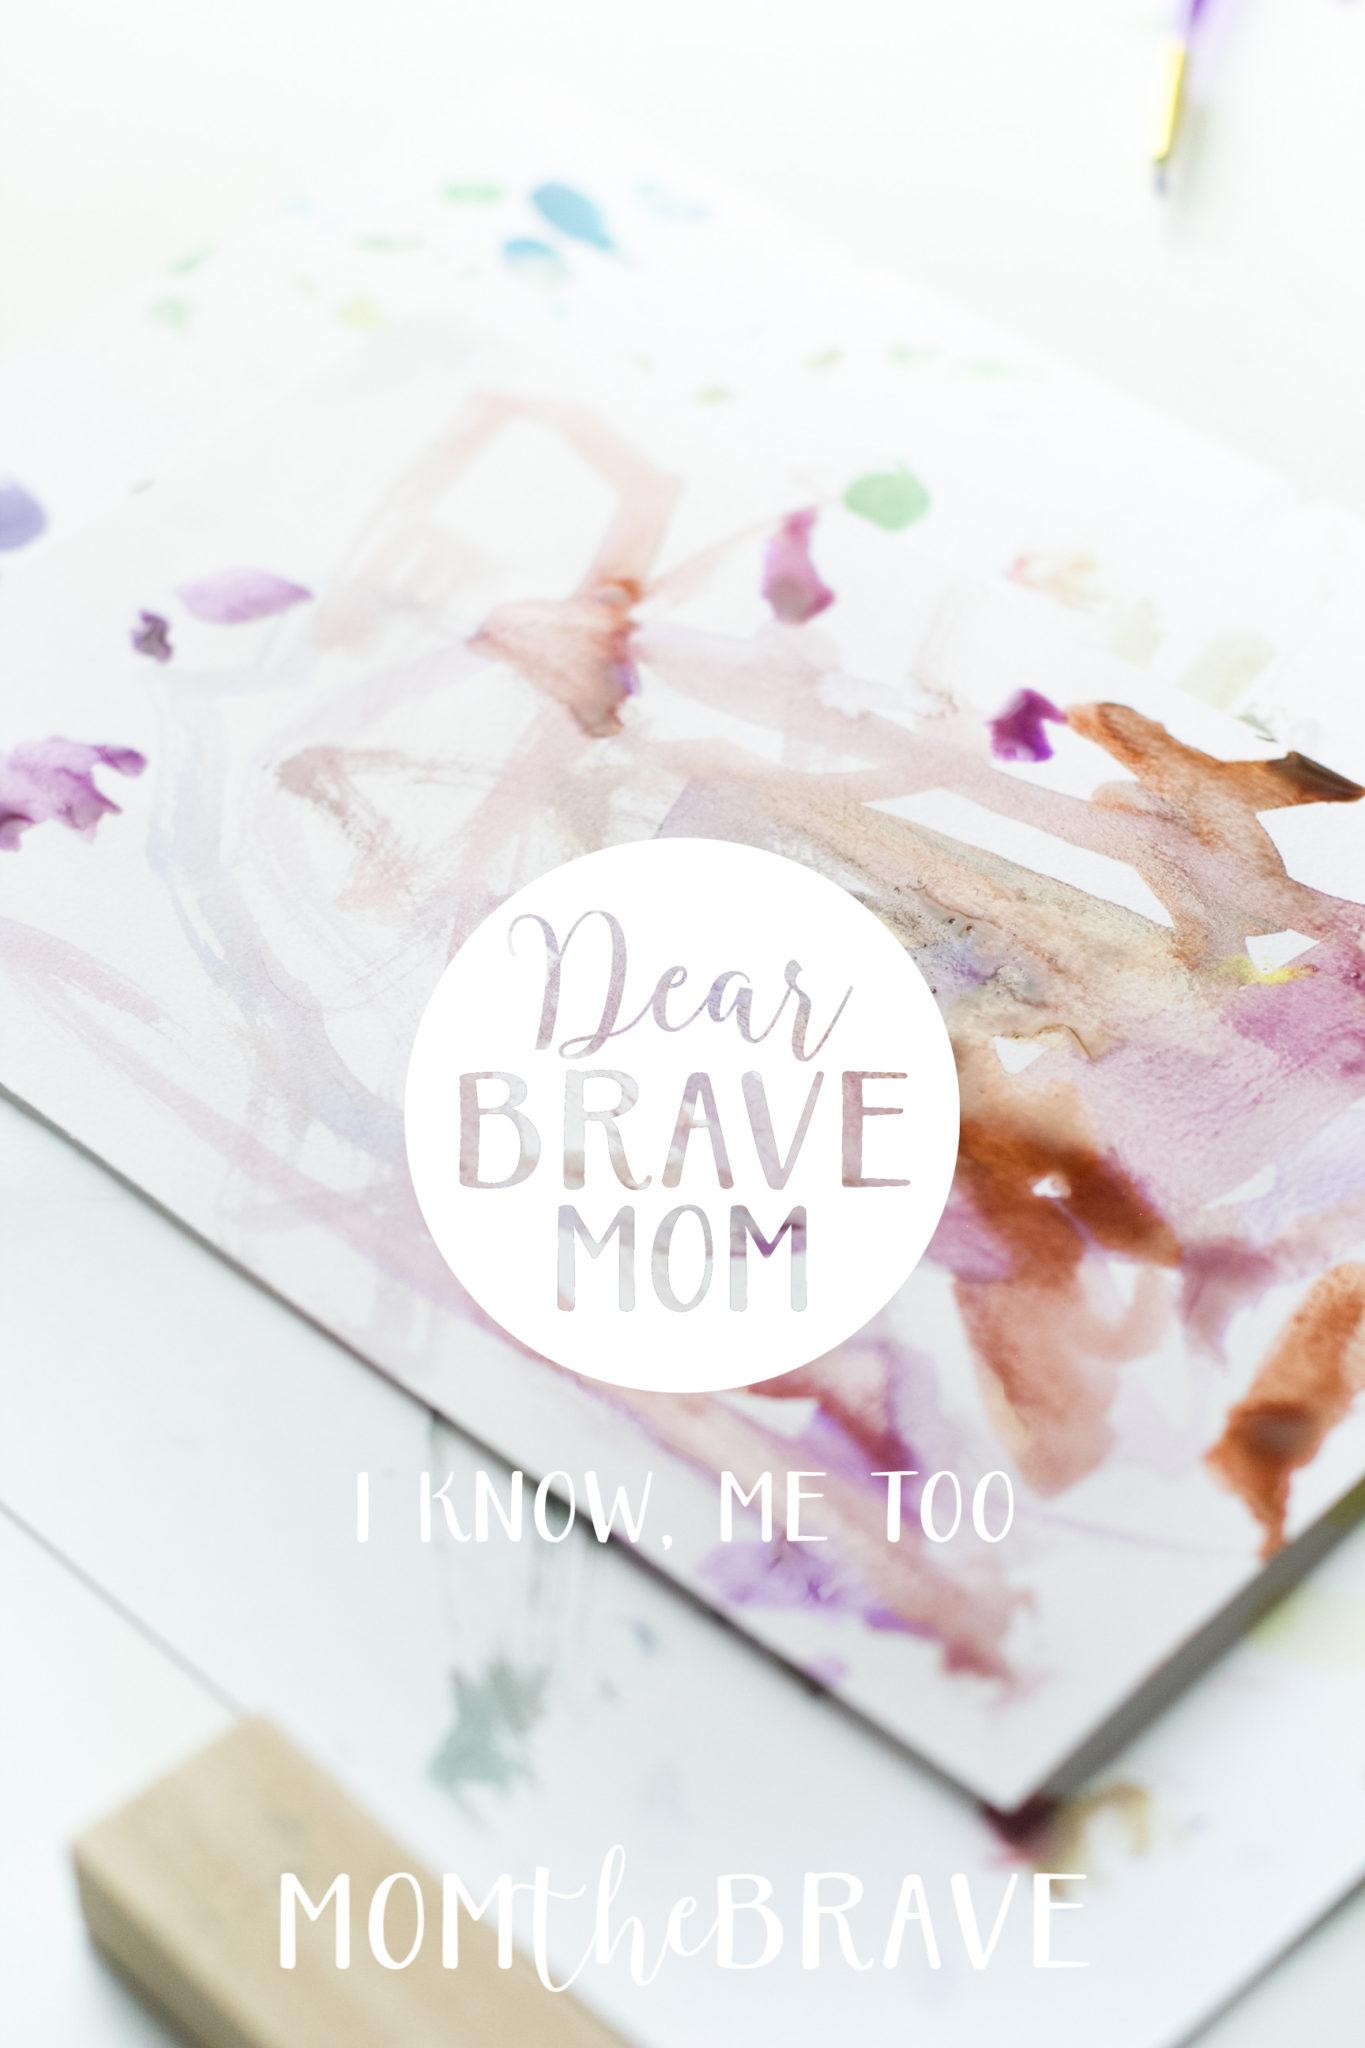 Dear Brave Mom: I know, me too.